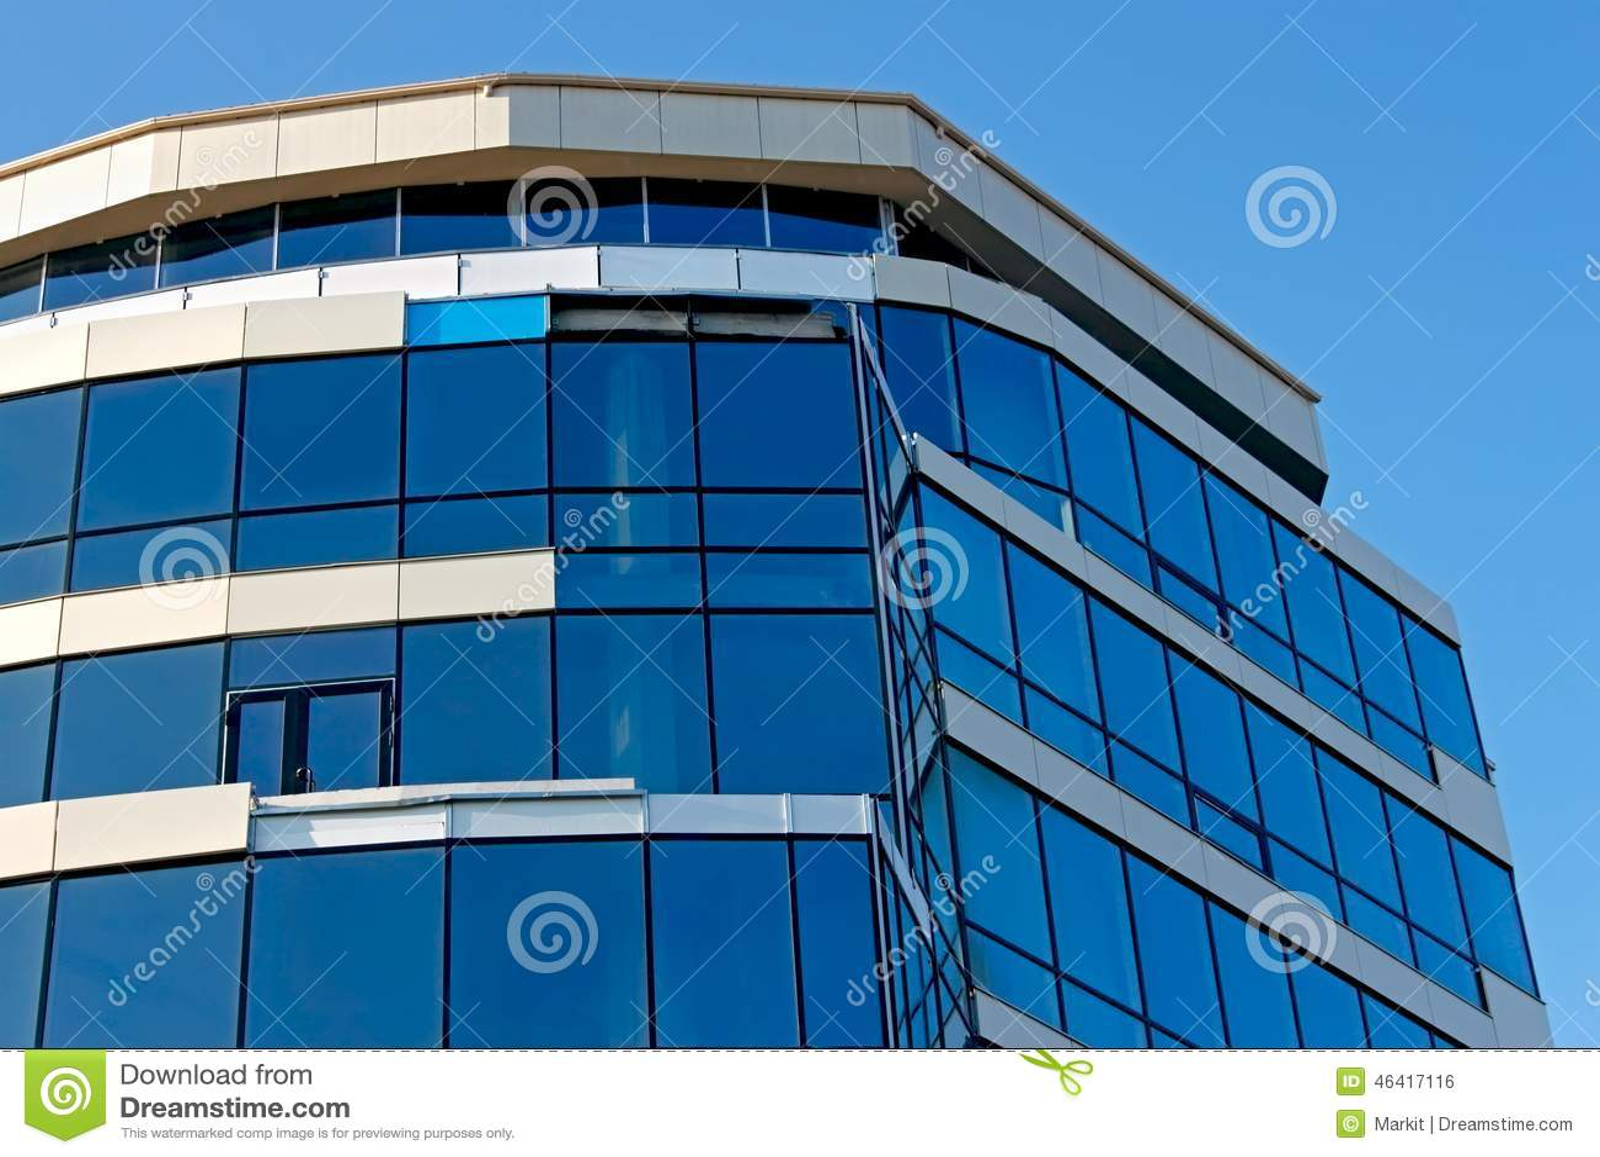 top part of the modern office building construction blue glass top modern office